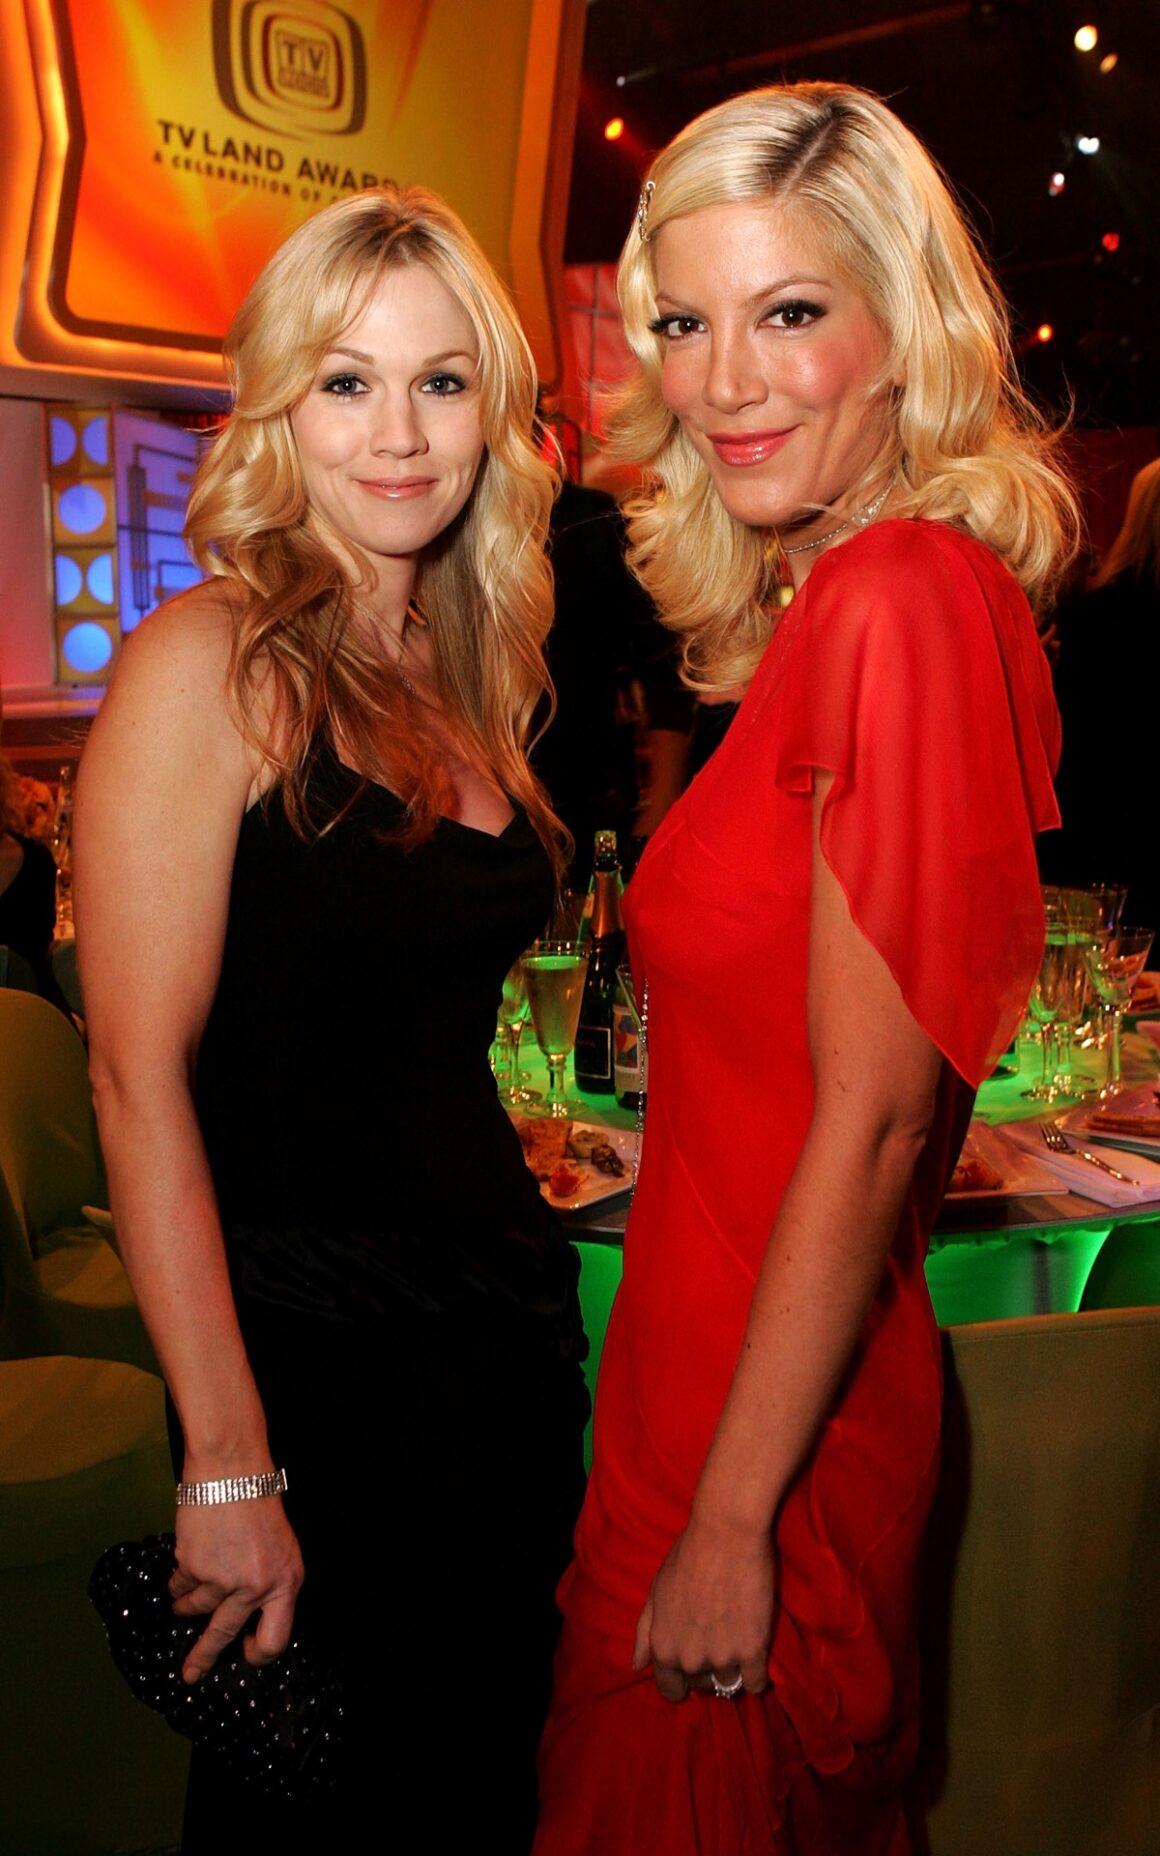 Tori Spelling and Jennie Garth 2005 TV Land Awards - Show